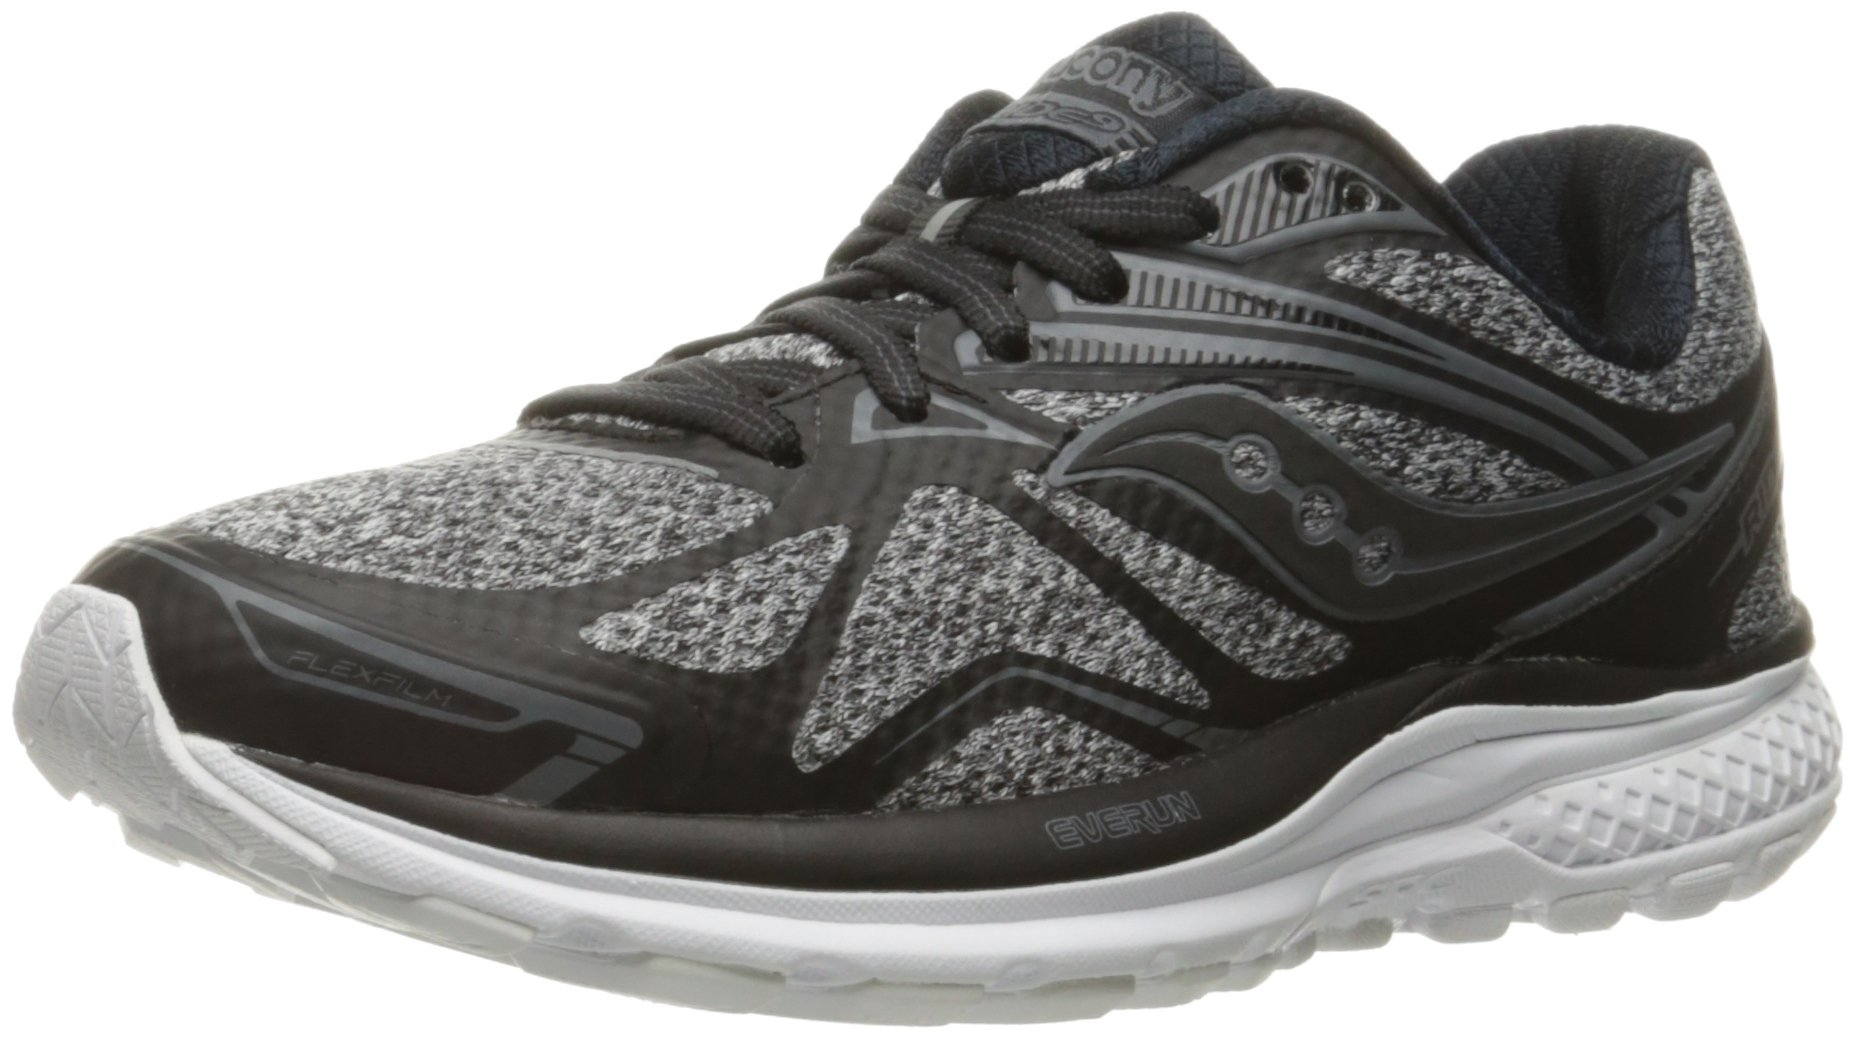 71Ee0MaNjfL - Saucony Women's Ride 9 Lr Running Shoe, Grey/Black, 5 M US